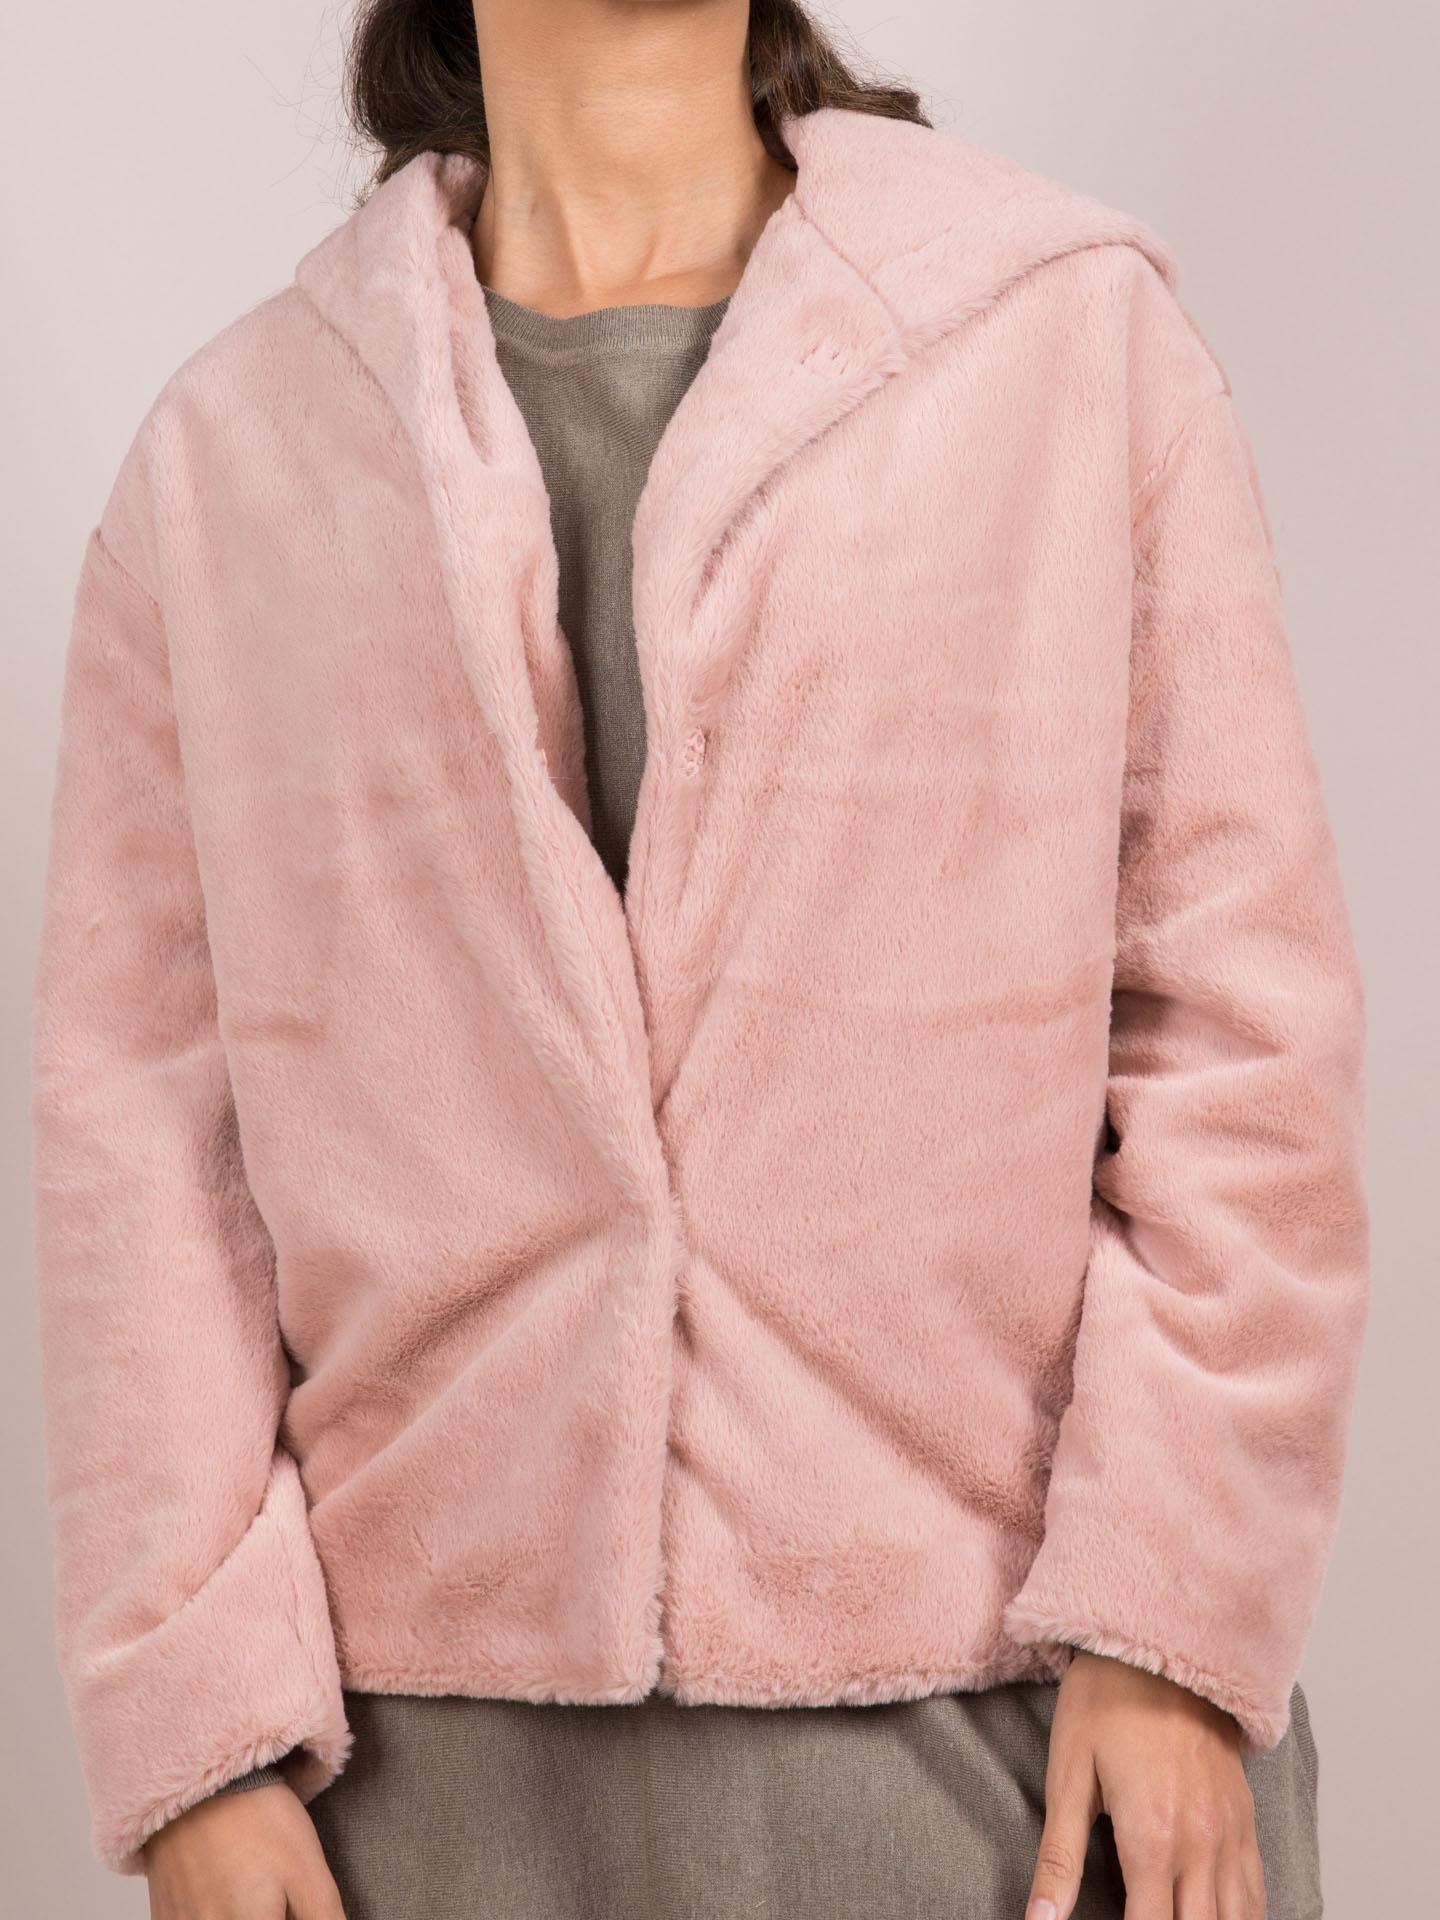 Ava Jacket Blush Pink Soft Faux Fur Coat Front